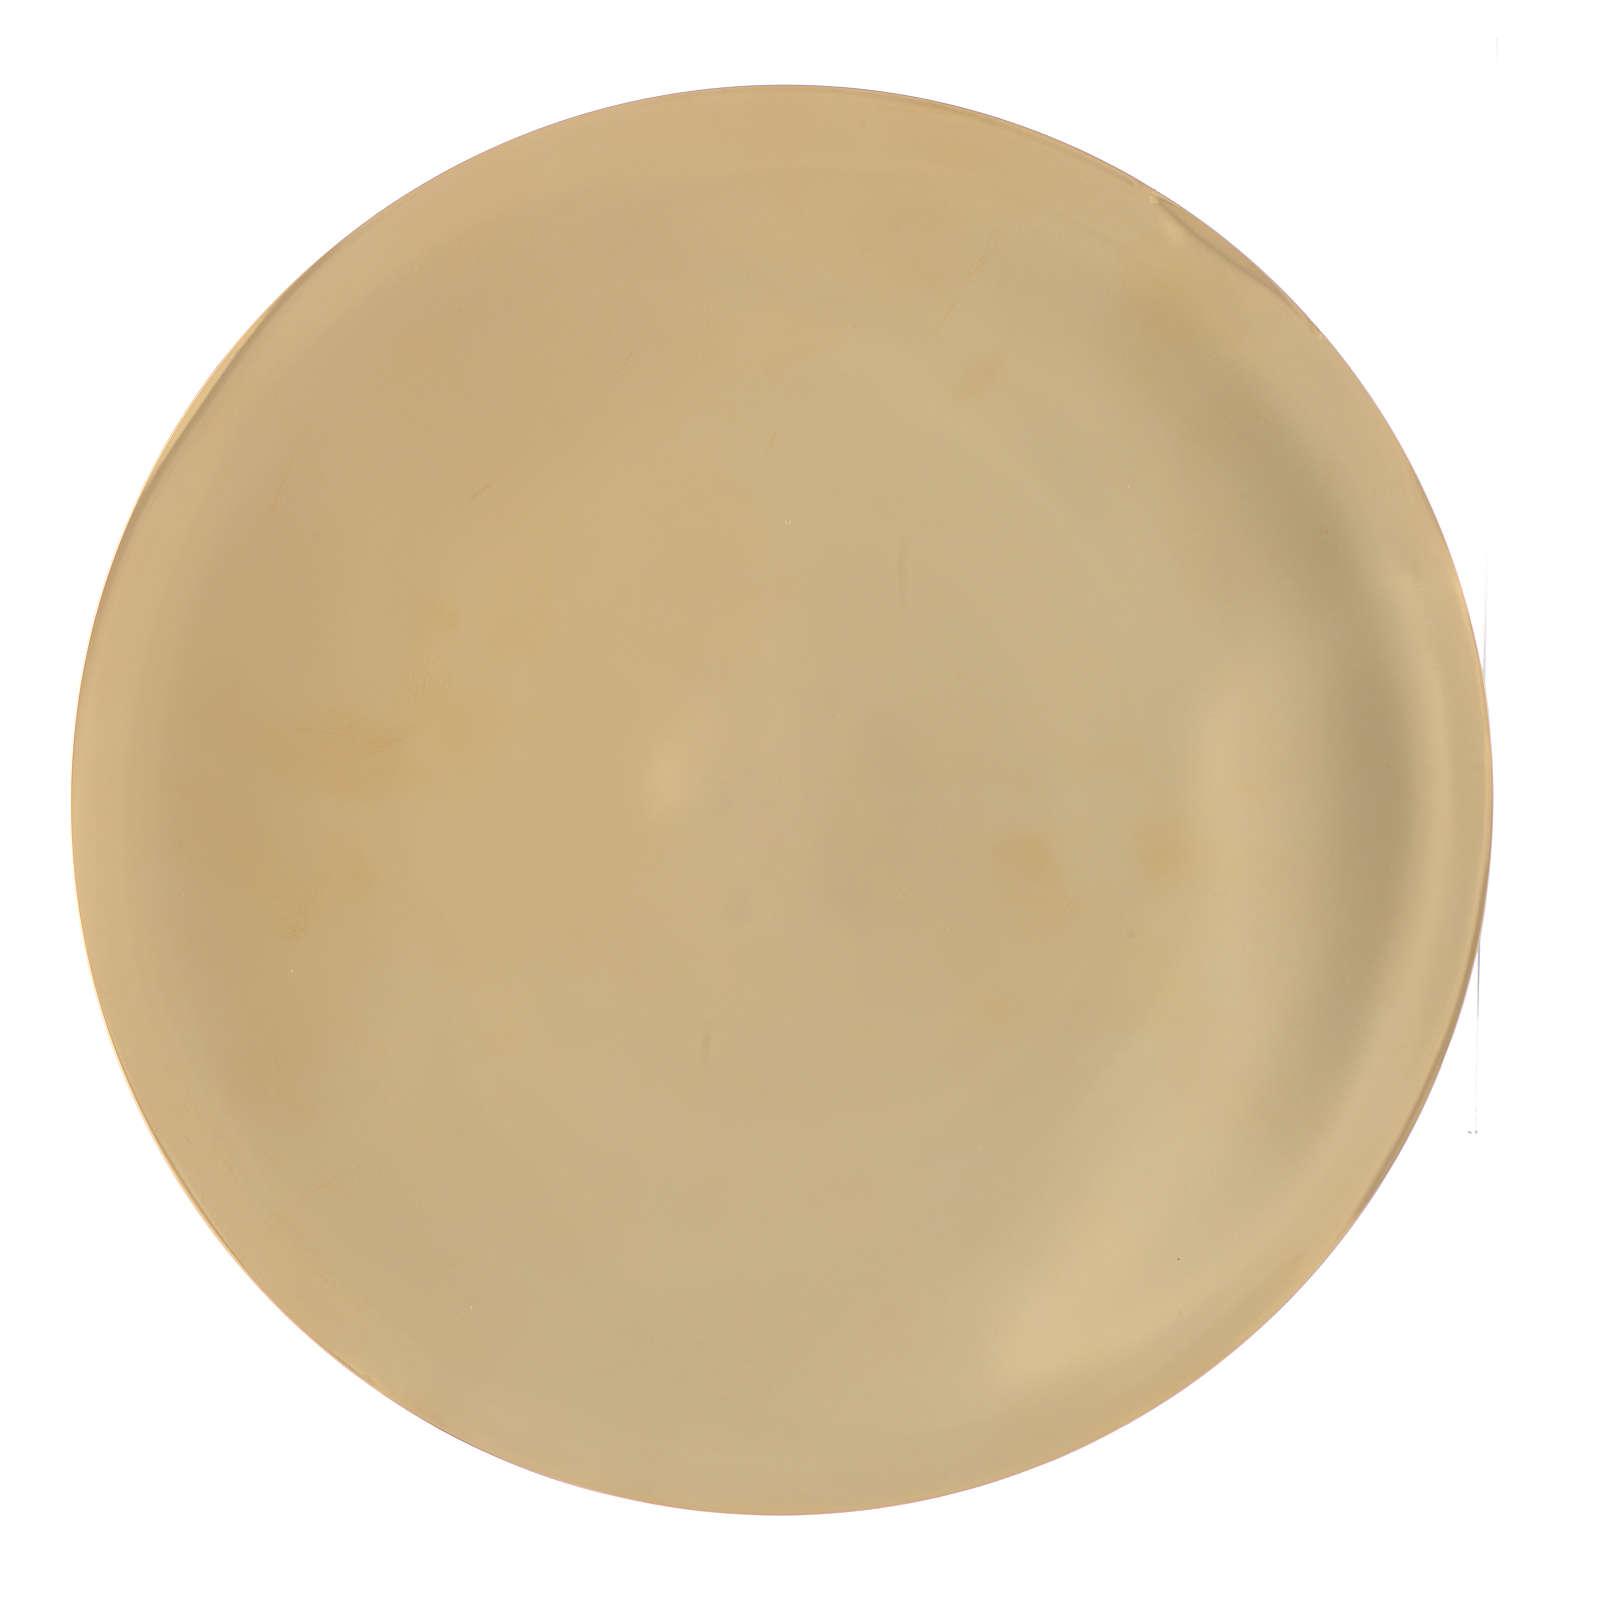 Patena ottone liscia lucida cm 25 4